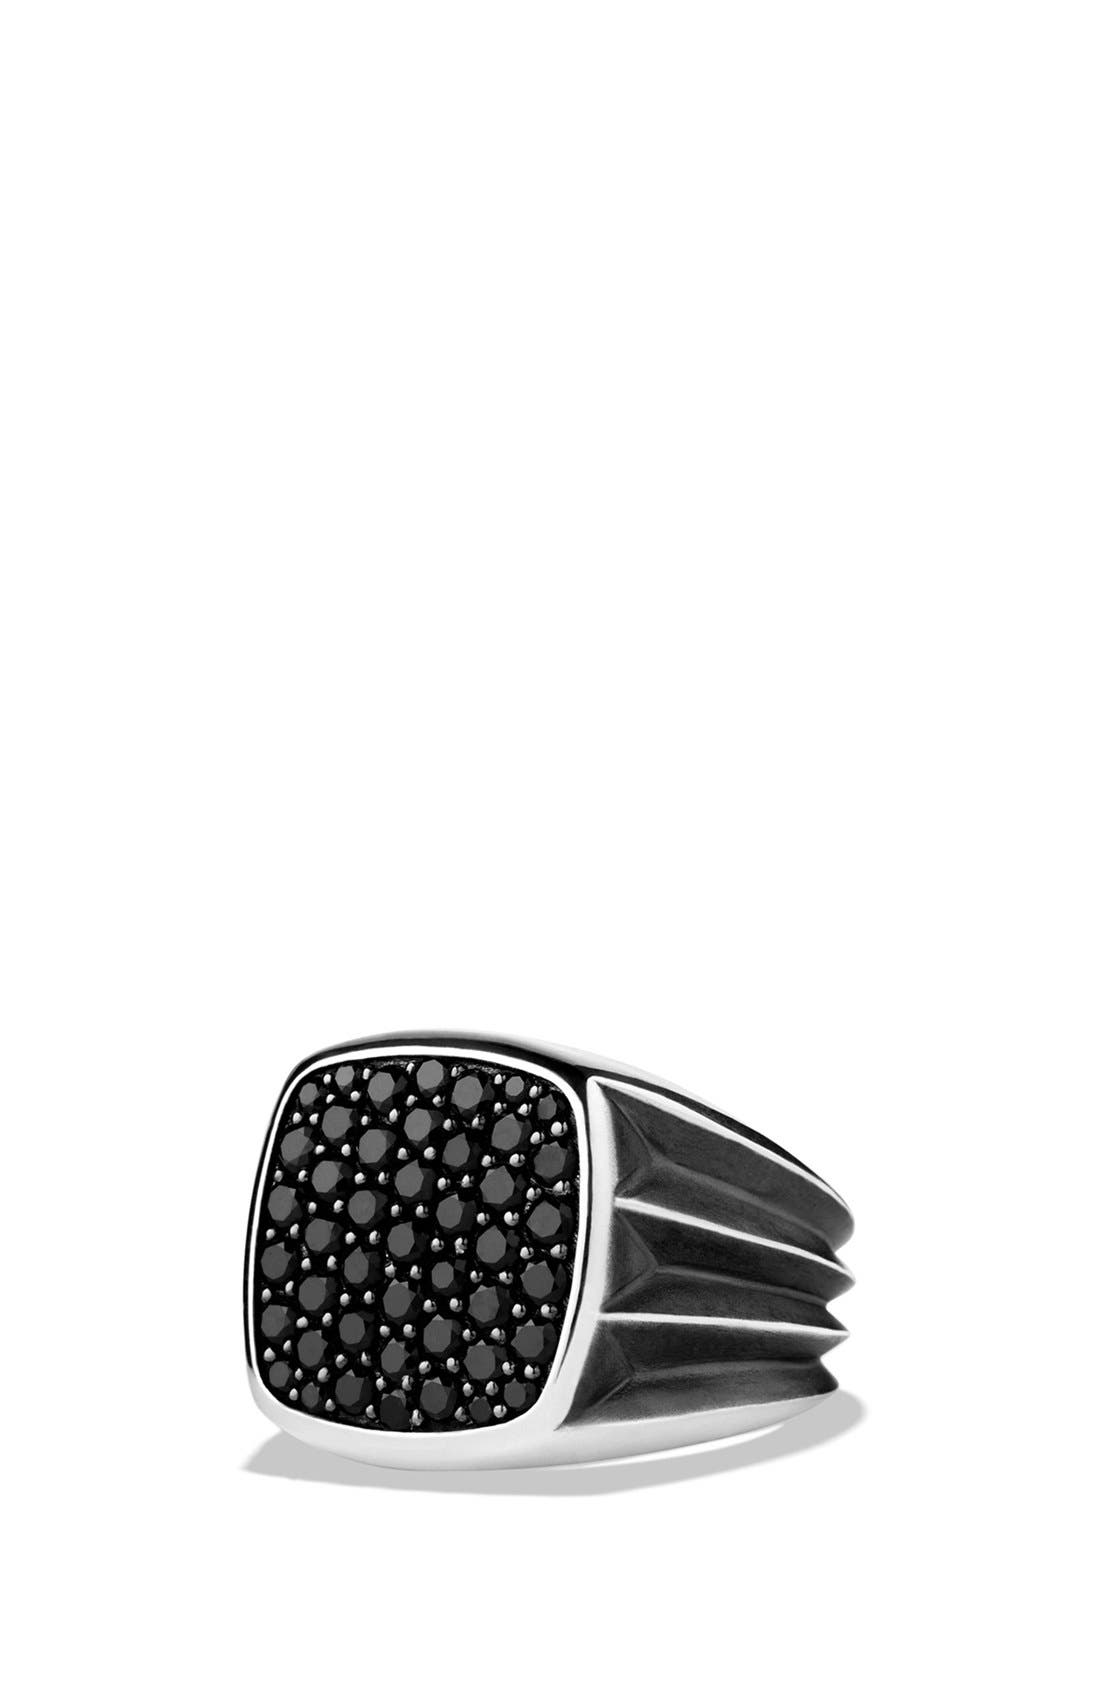 David Yurman 'Knife Edge' Signet Ring with Black Diamonds